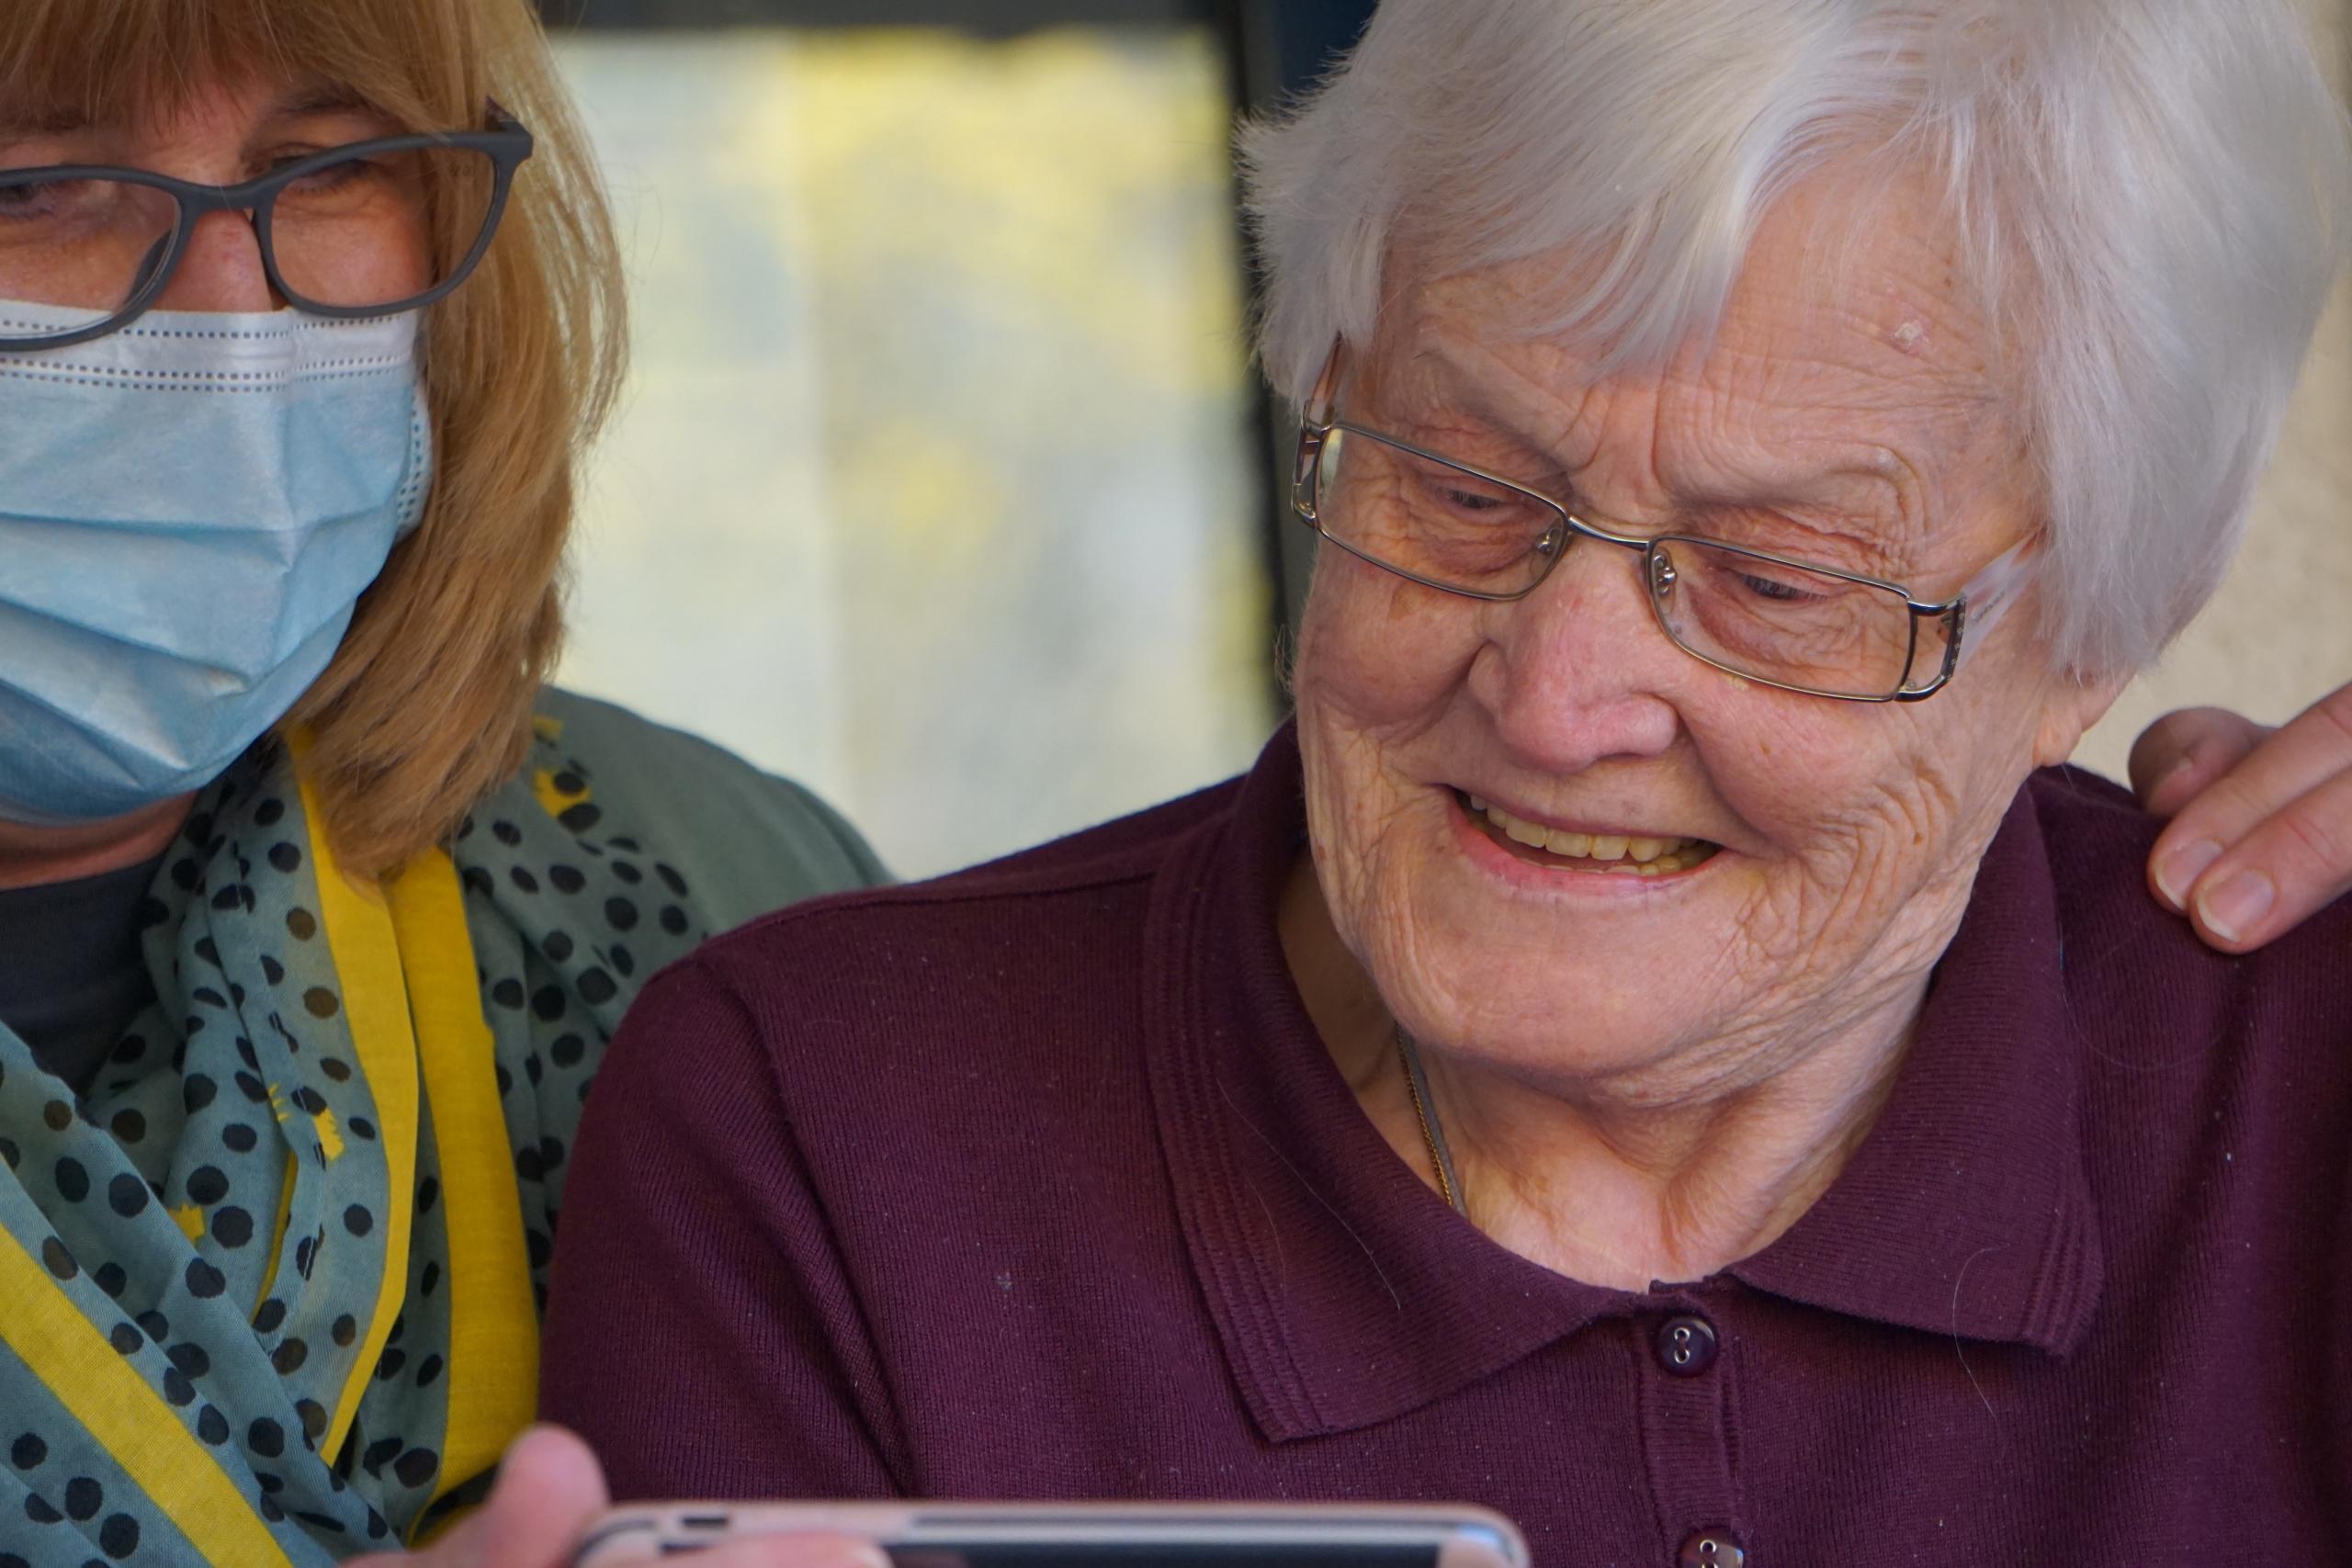 24/7 Live-in Caregivers